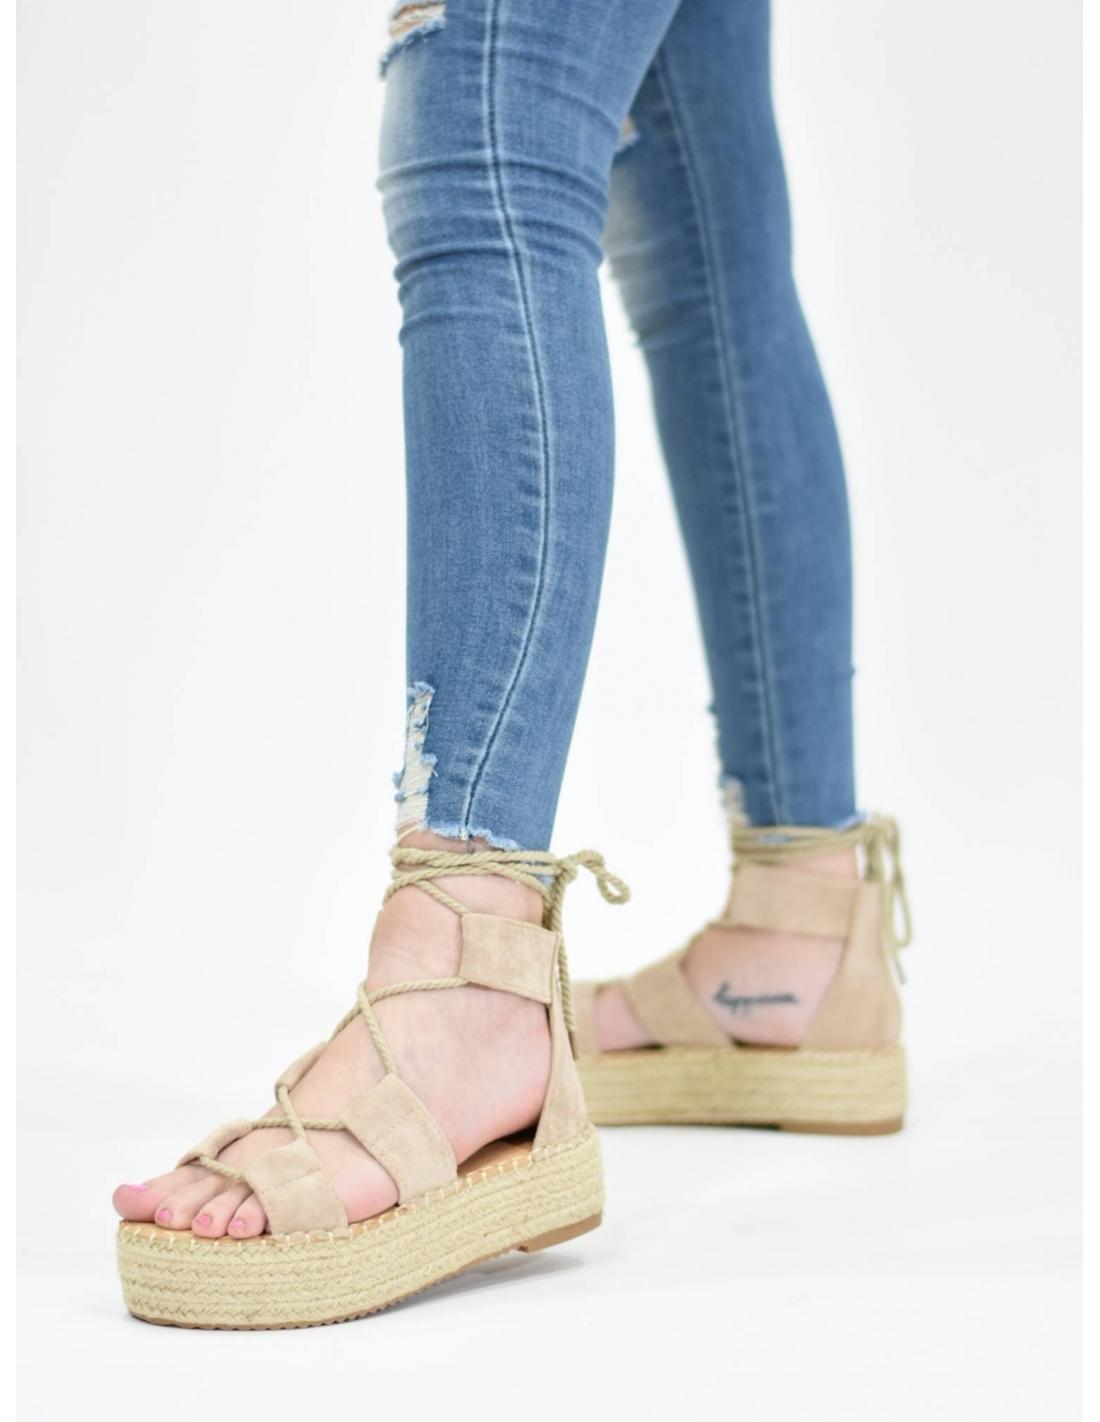 Sandalia atada beige